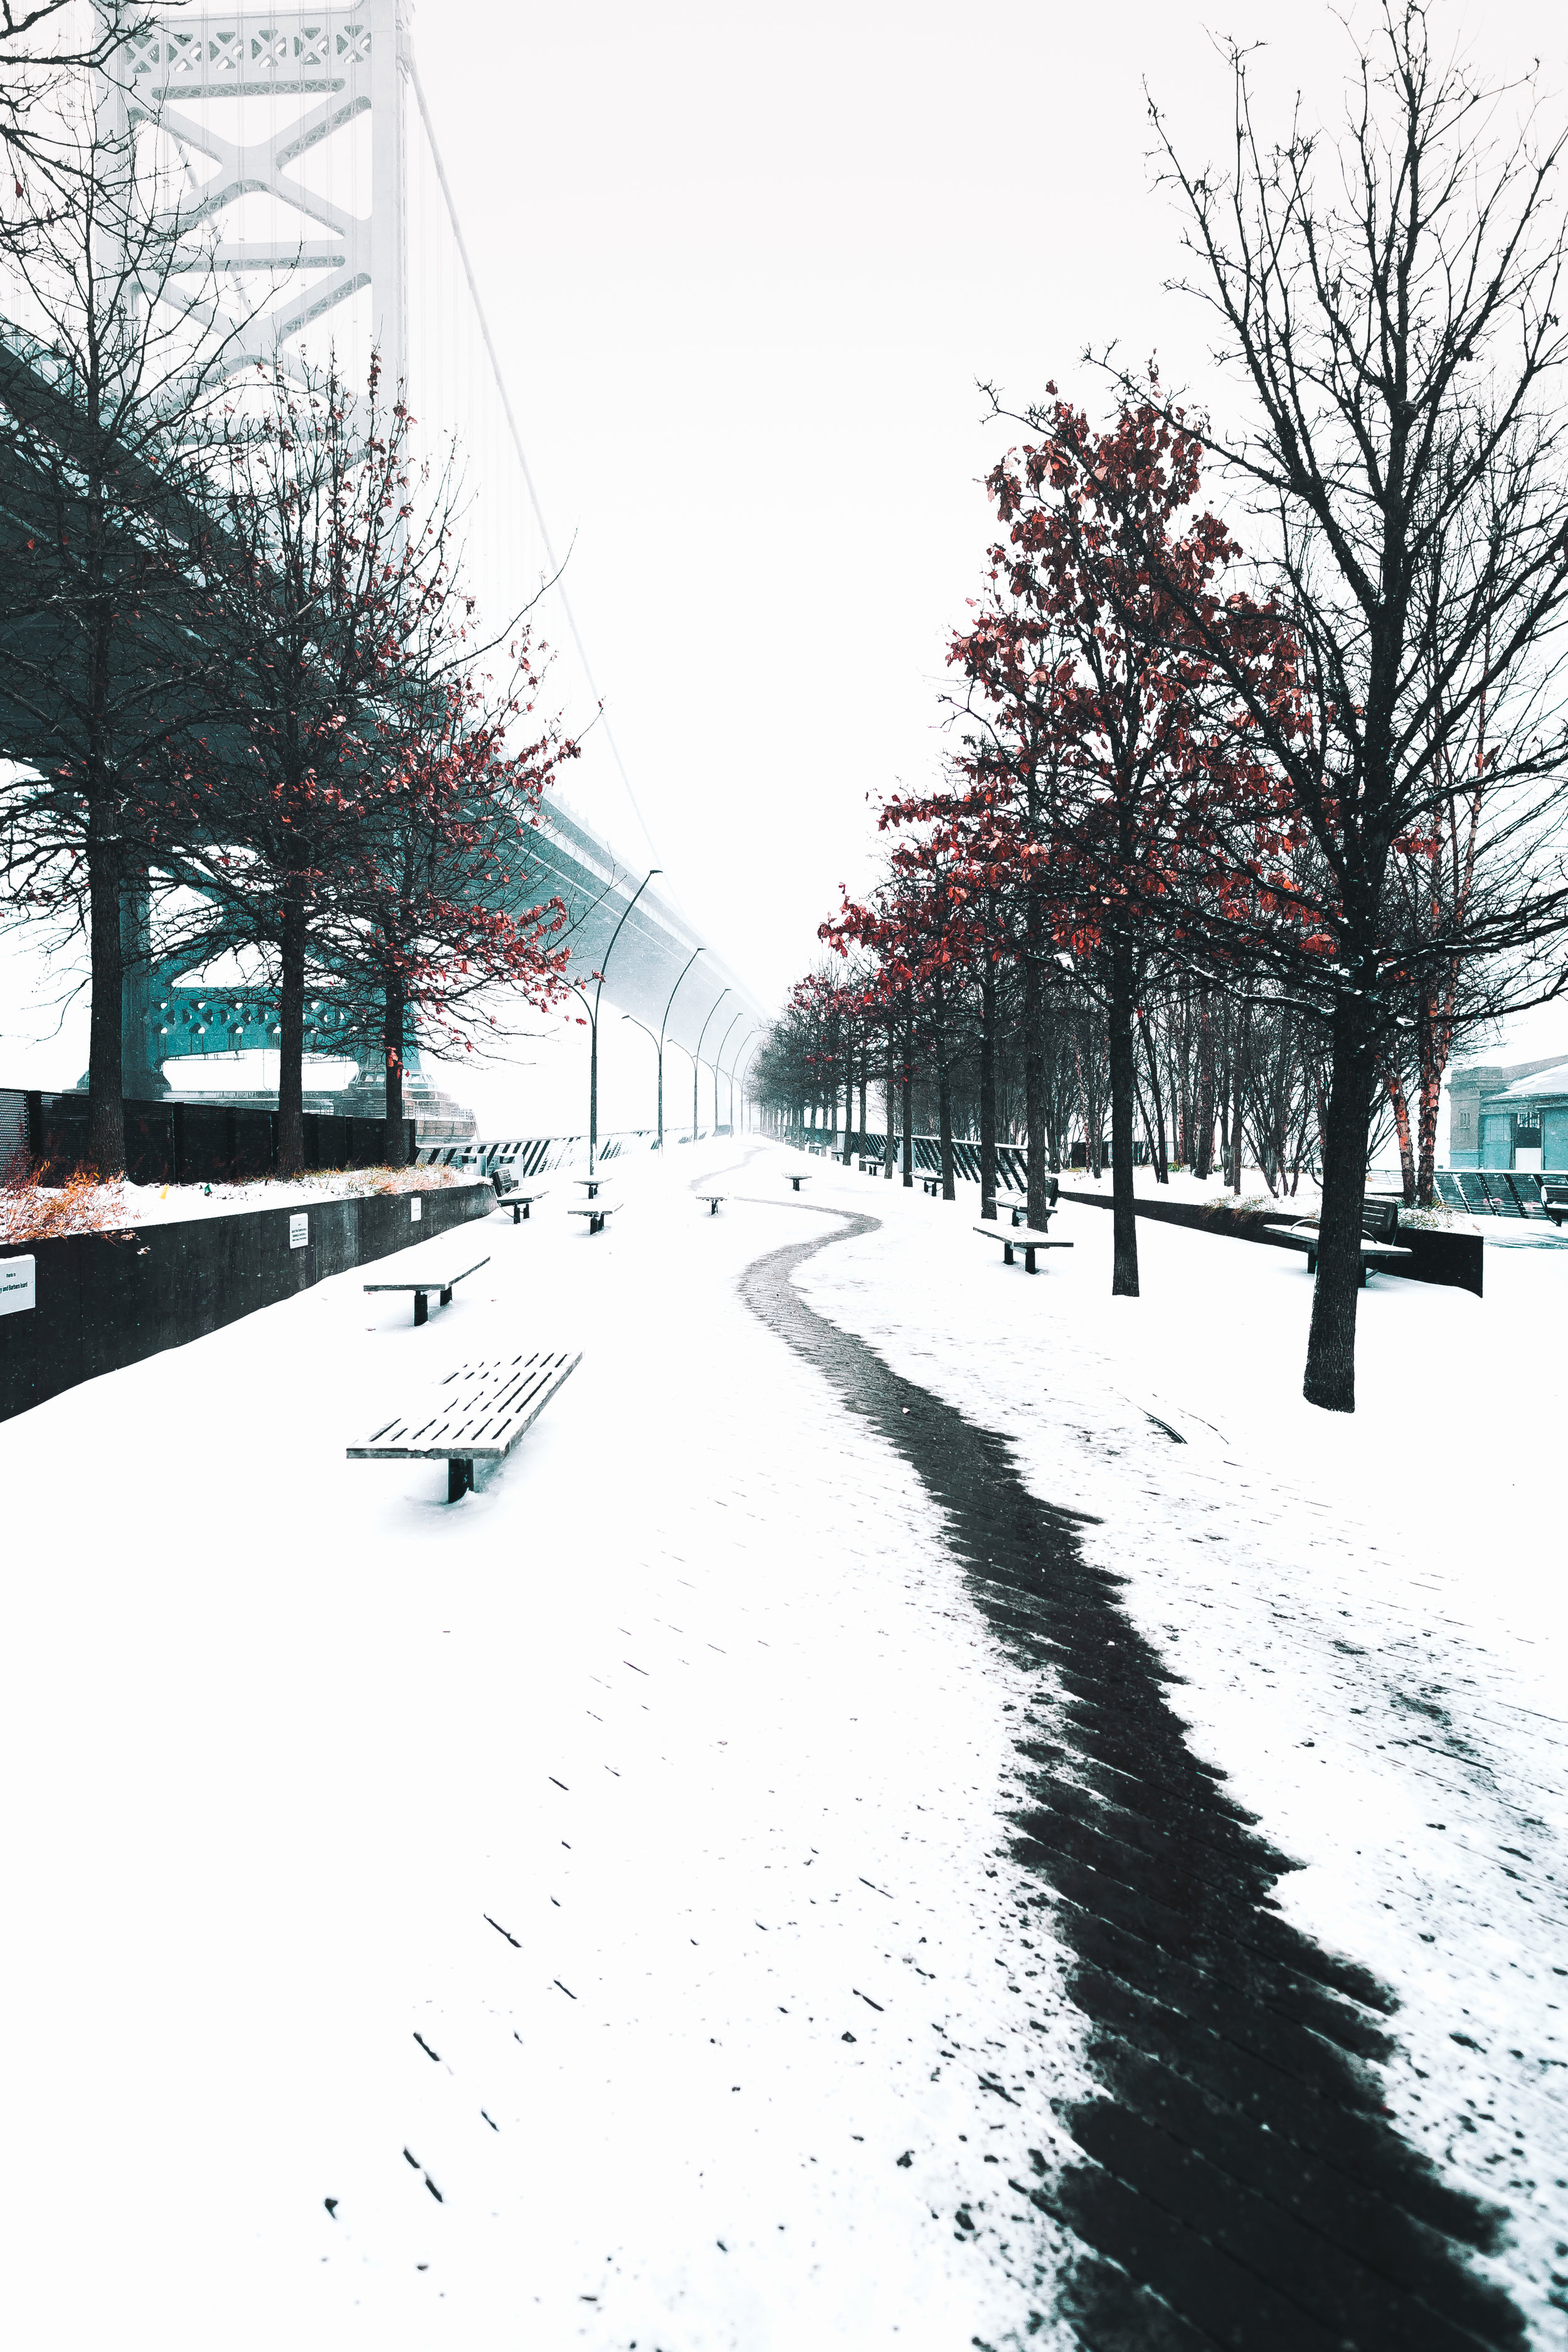 SNOW DAY-4226.jpg